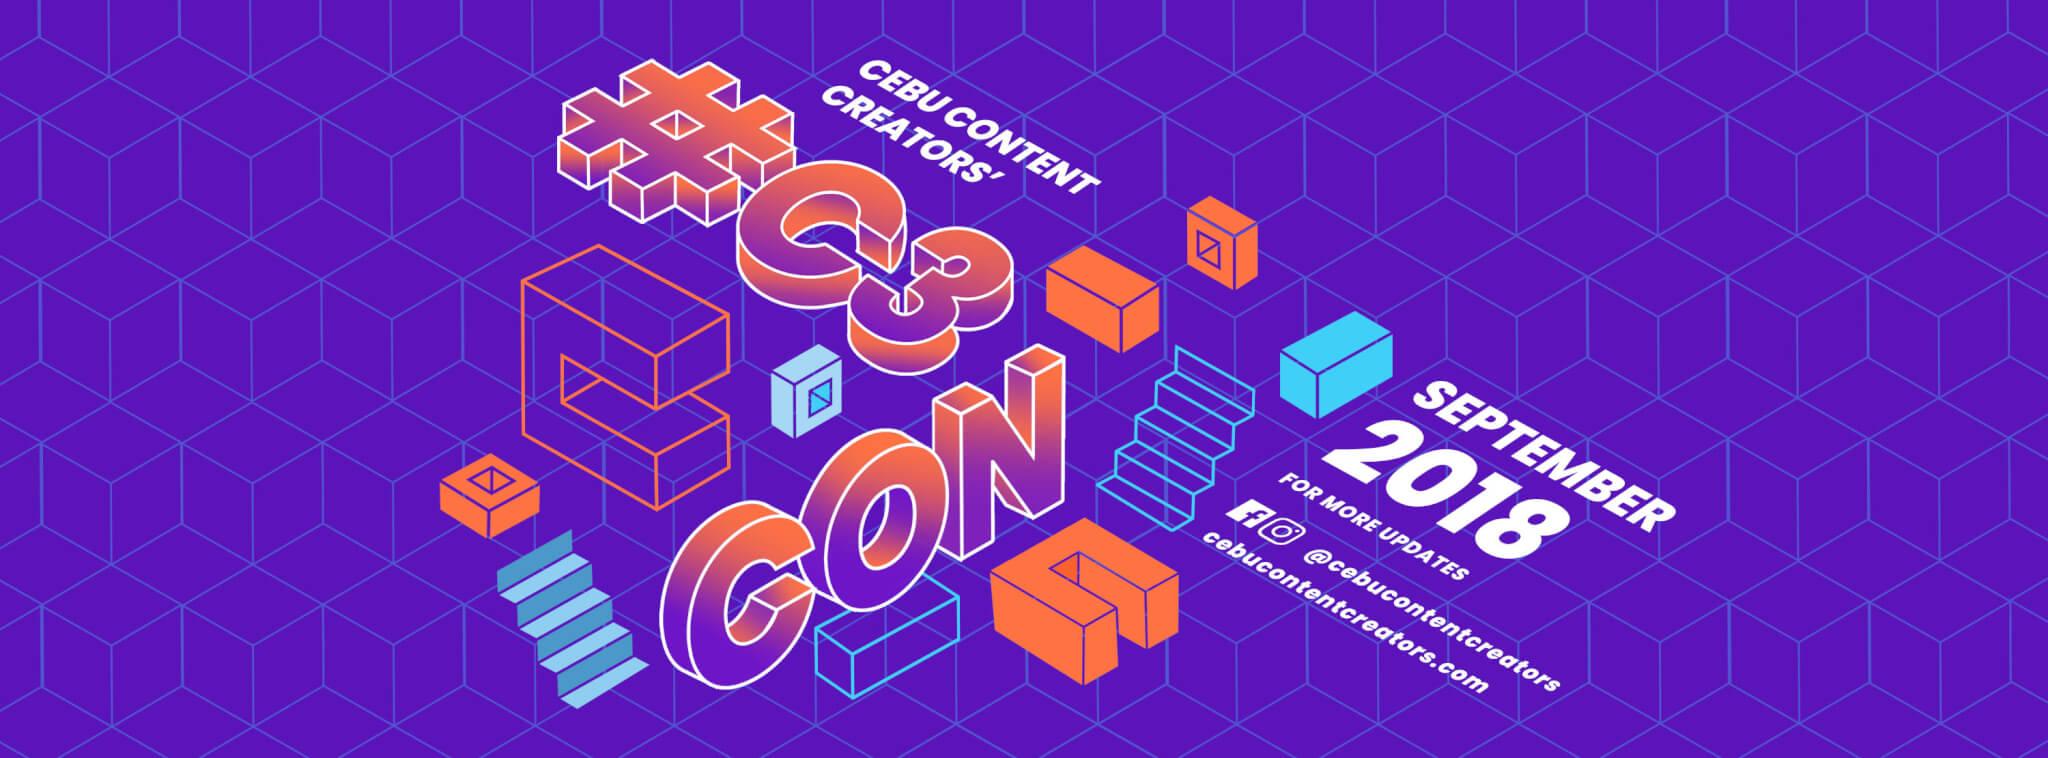 join-cebu-creators-month-2018-with-cebu-content-creators-lets-celebrate-together